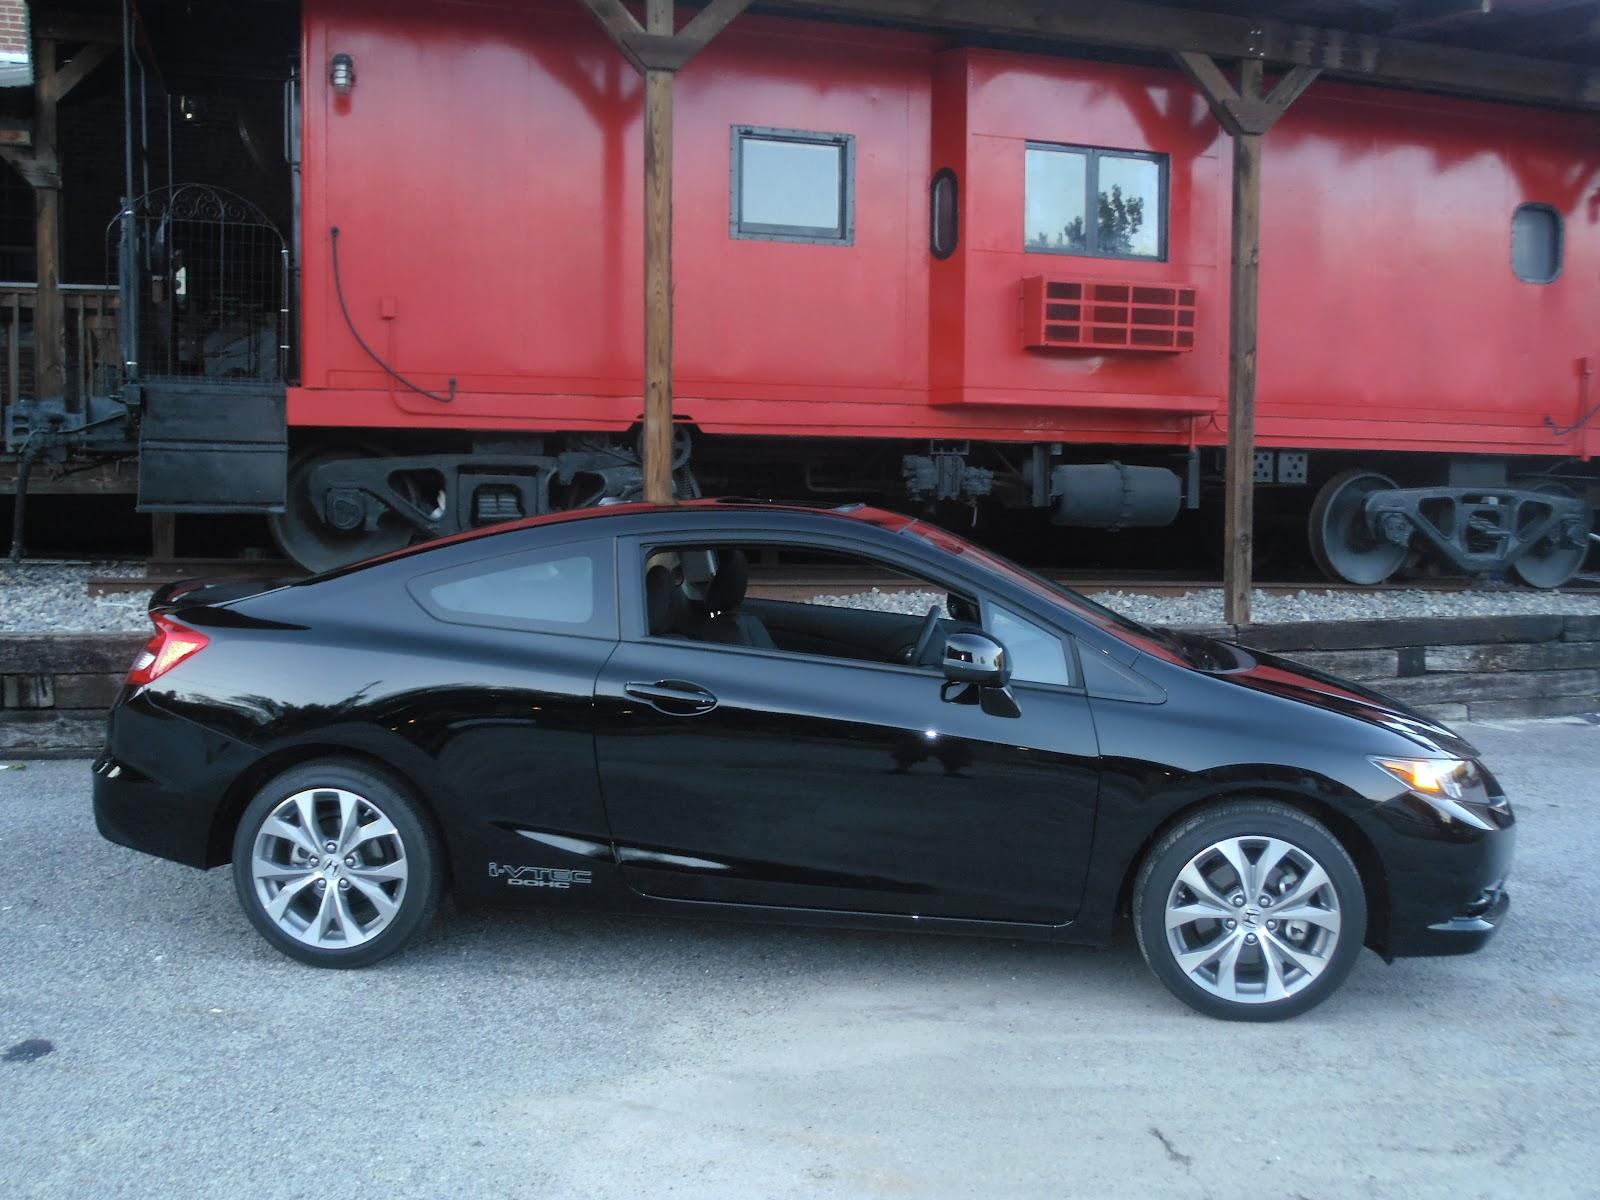 2012 Honda Civic Si 2 Door: Fast, Fun And Affordable